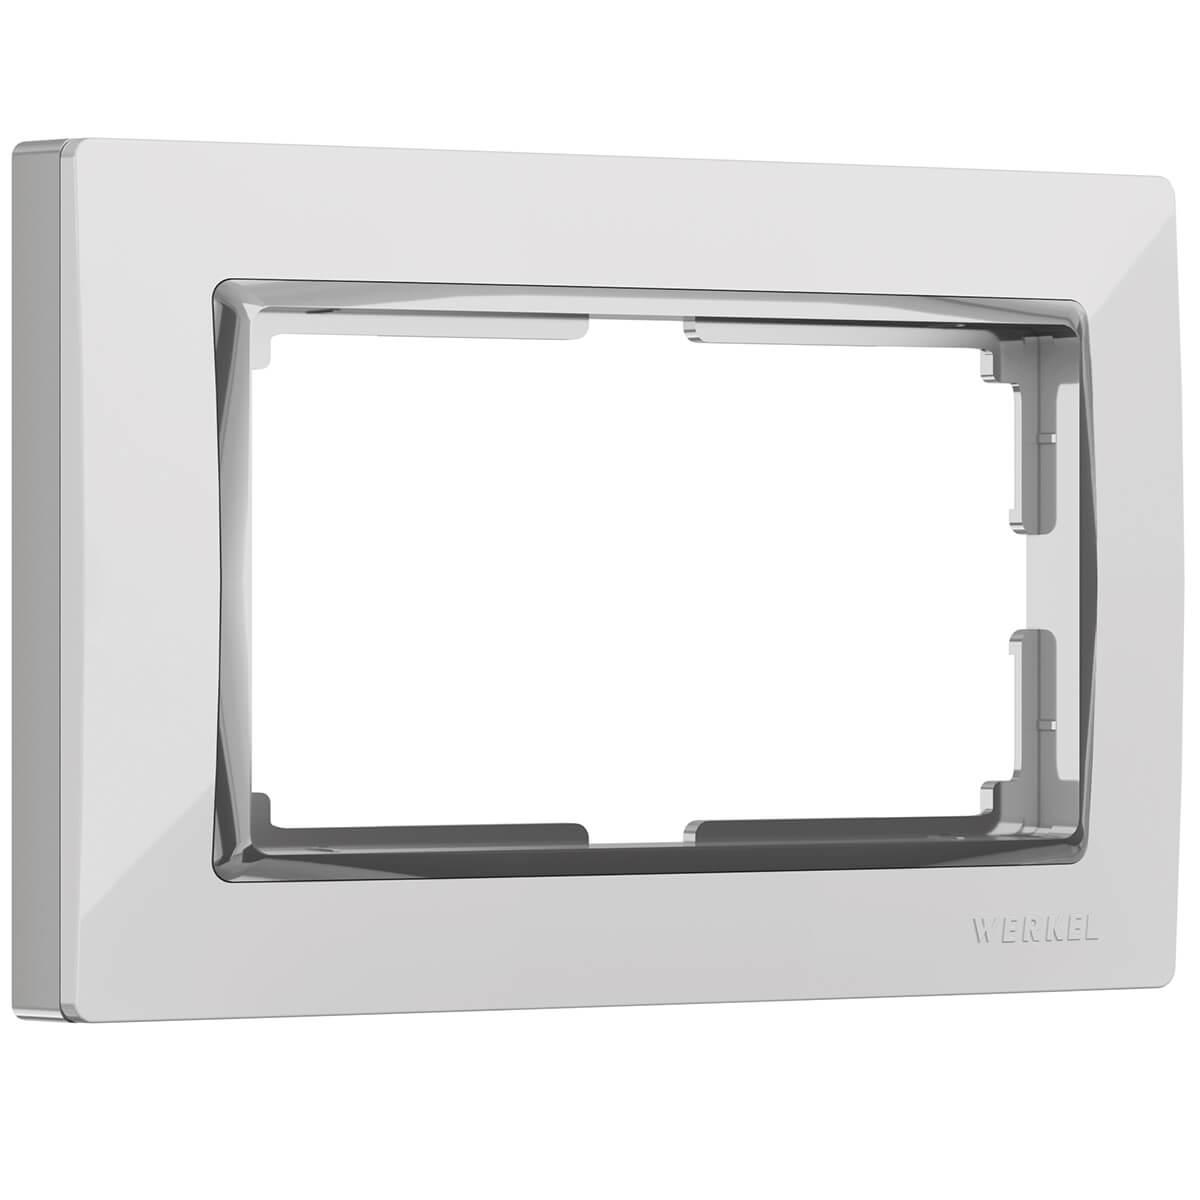 цена на Рамка Snabb для двойной розетки белый WL03-Frame-01-DBL-white 4690389073137